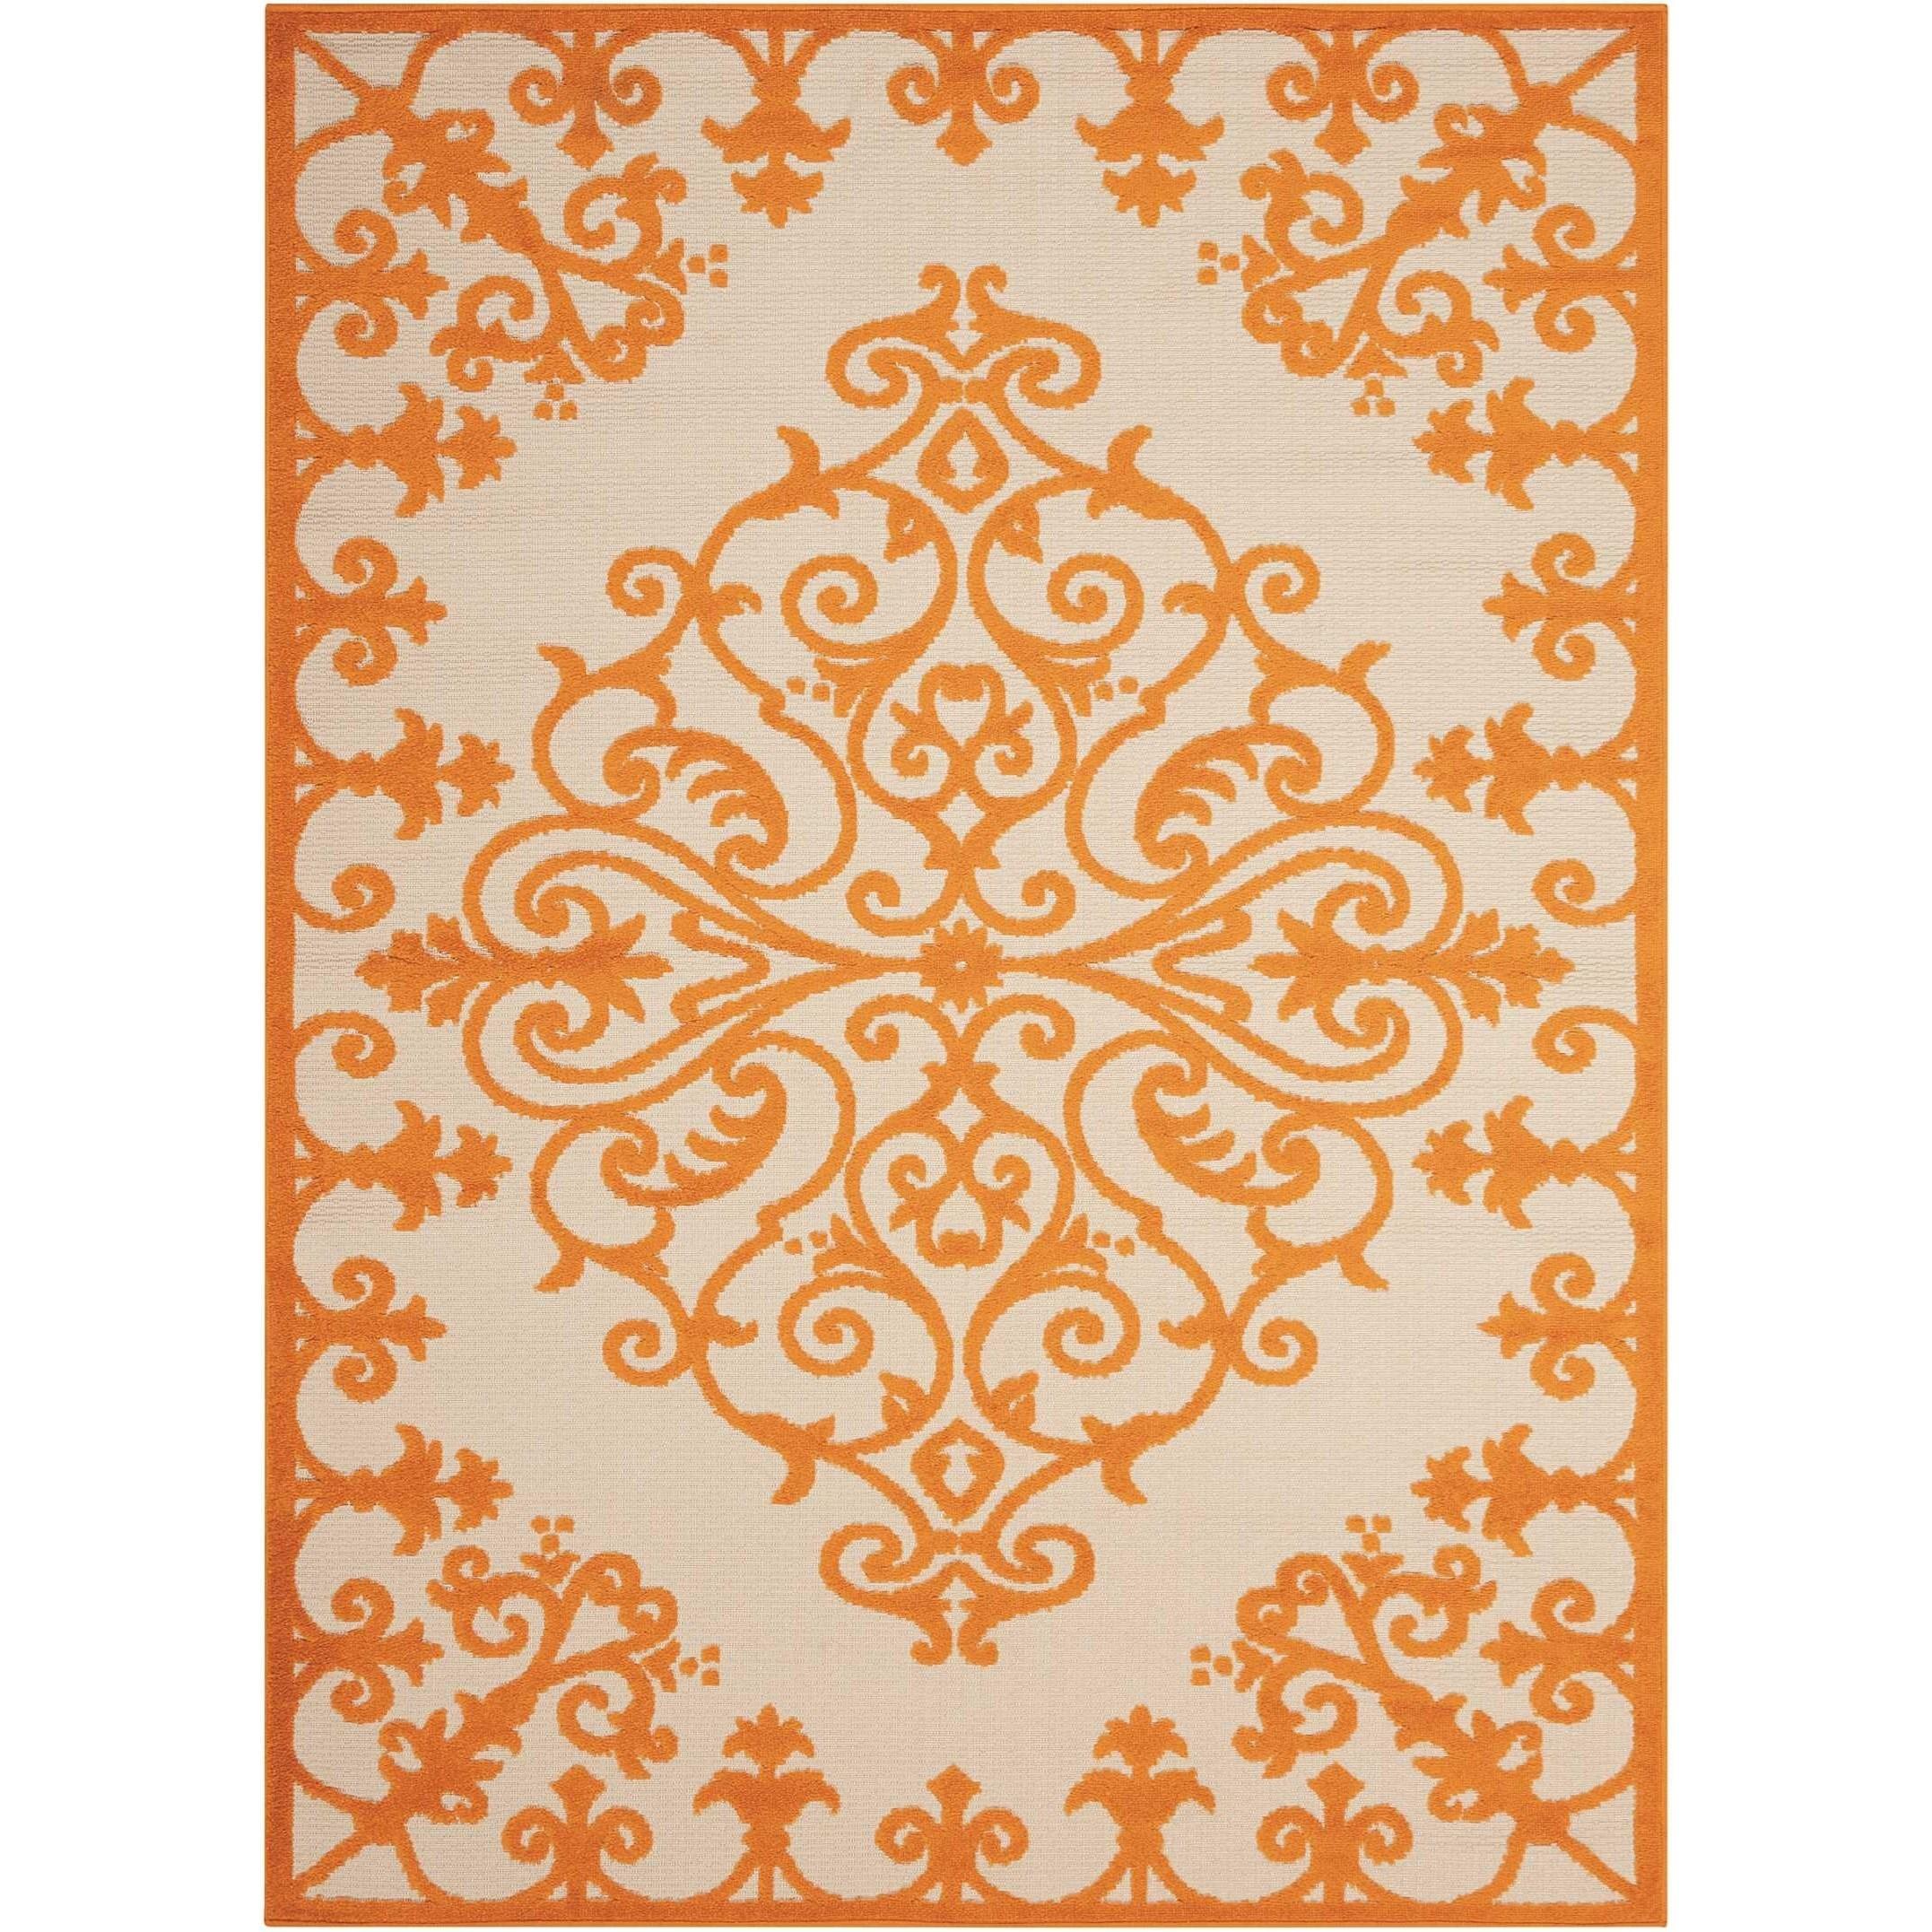 "Aloha 7'10"" x 10'6"" Orange Rectangle Rug by Nourison at Sprintz Furniture"